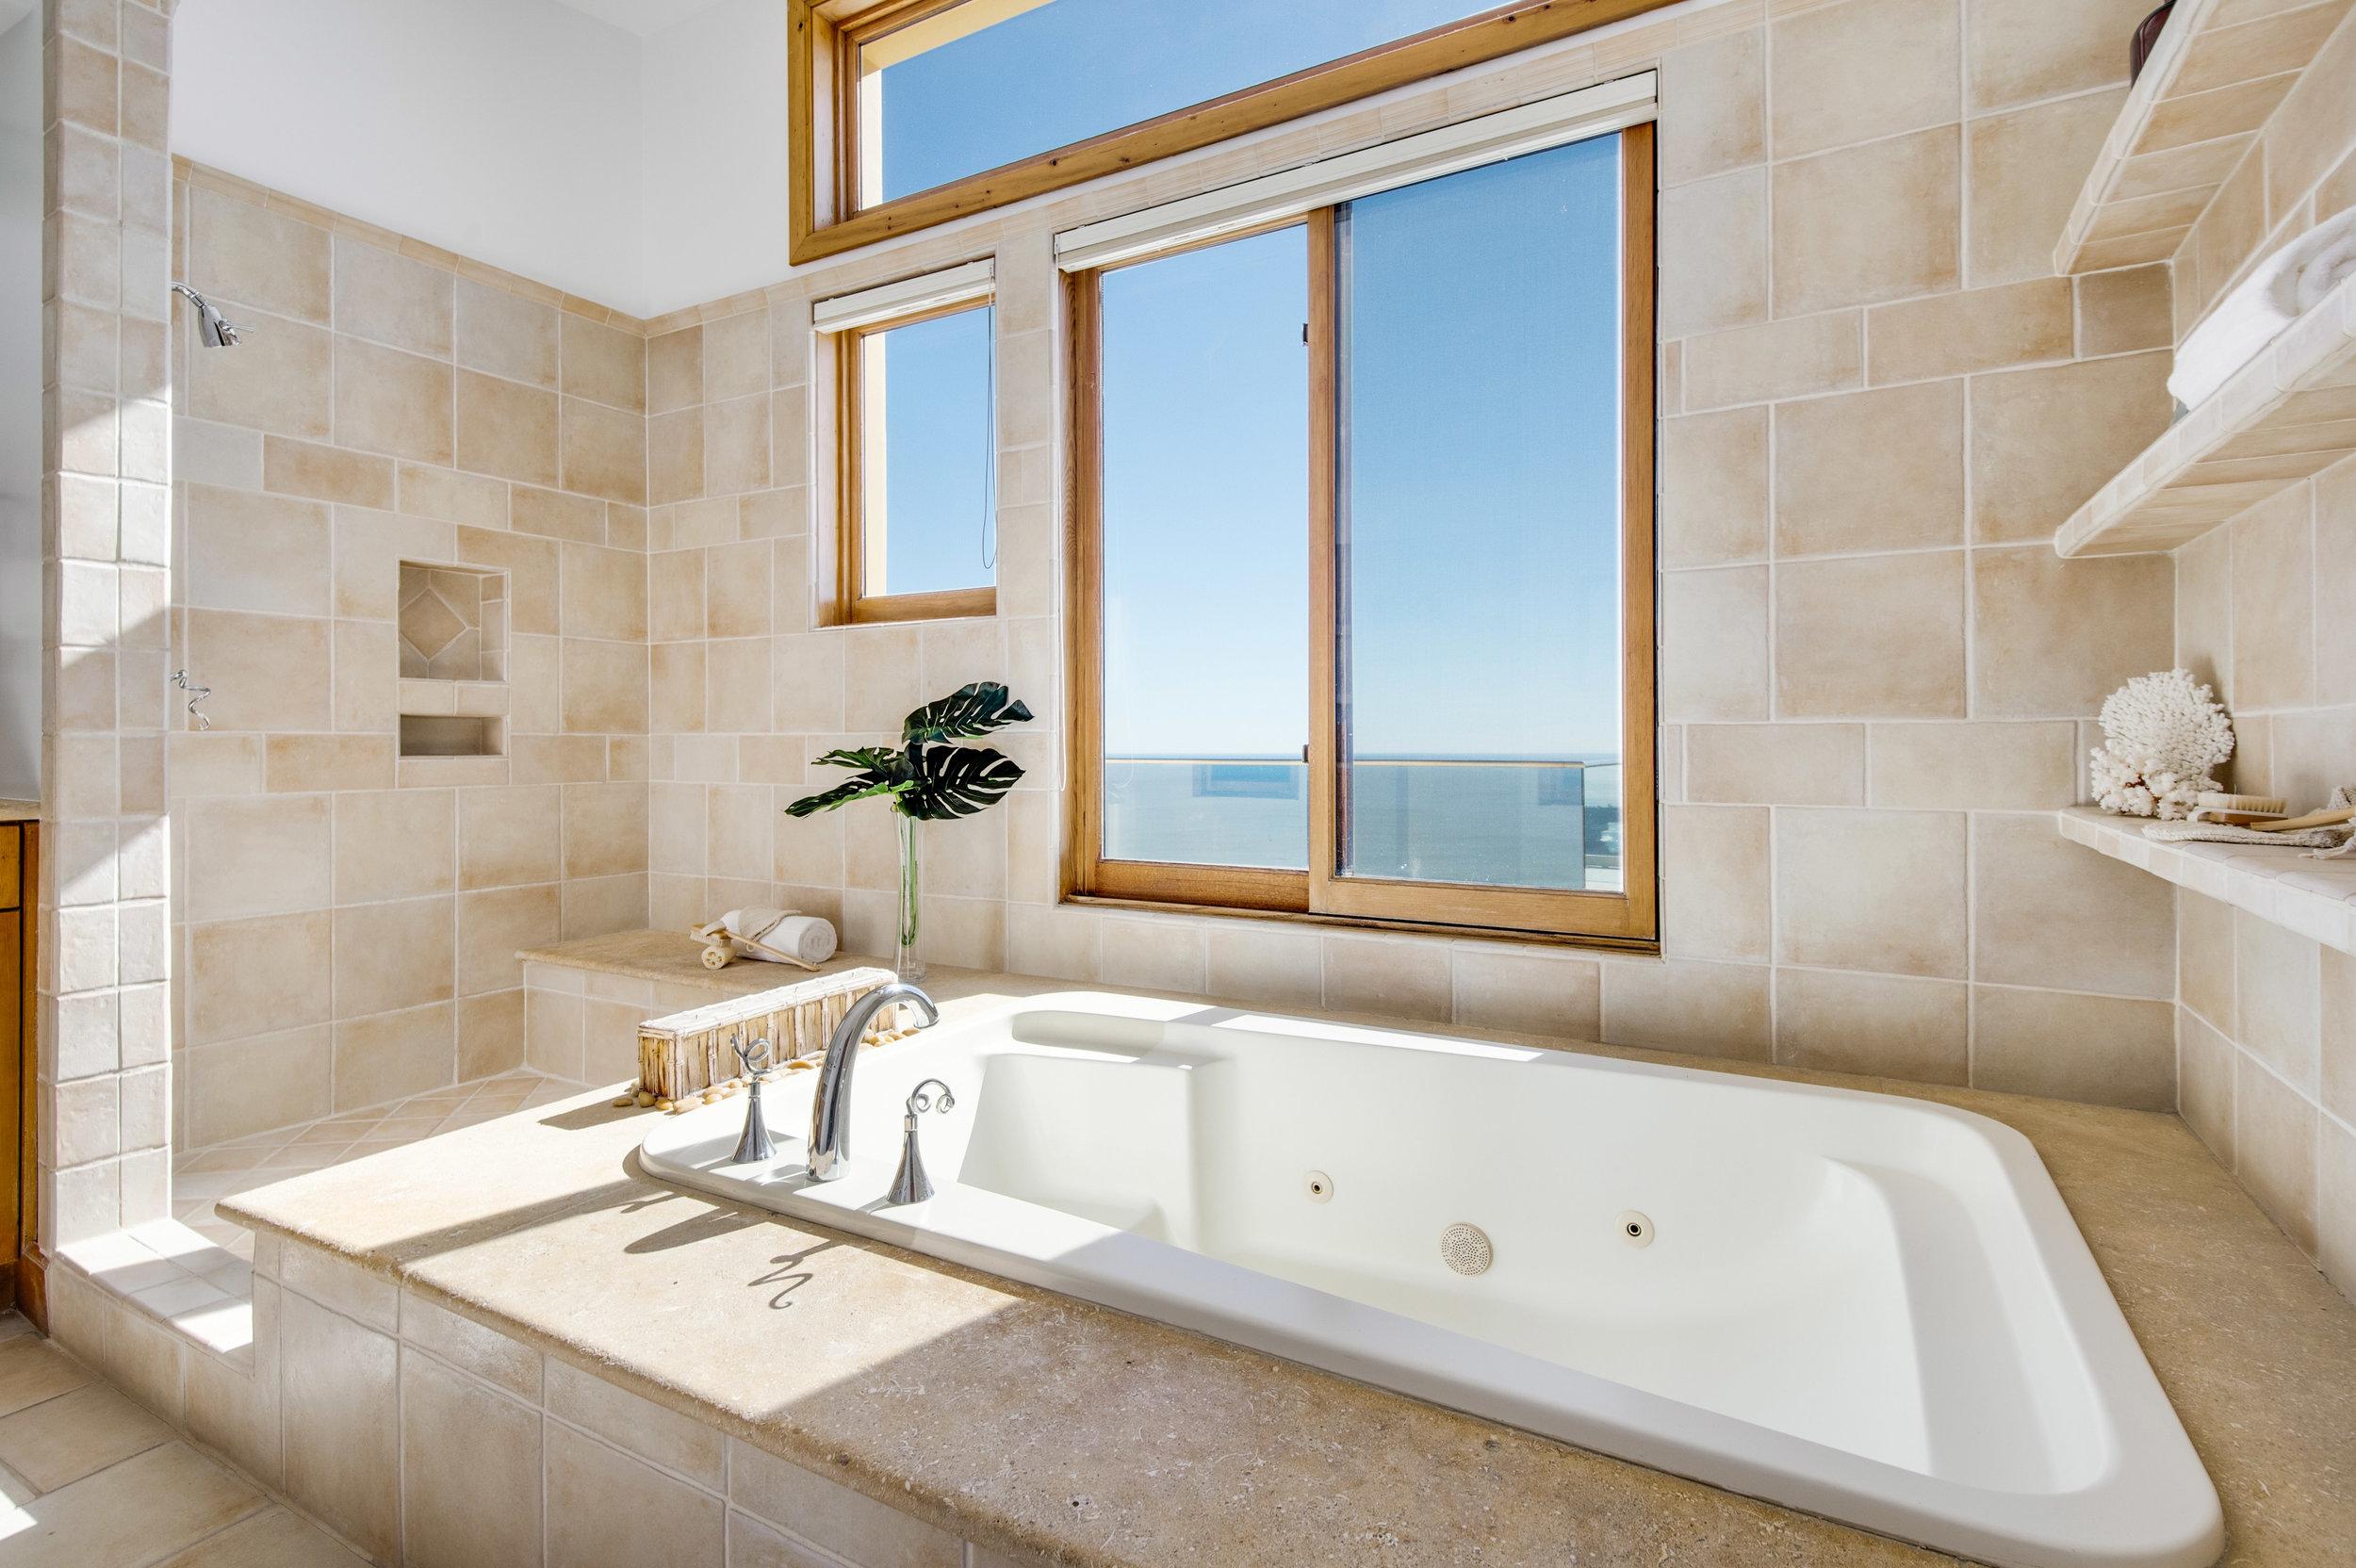 019 Bathroom 27475 Latigo Bay View Drive For Sale Lease The Malibu Life Team Luxury Real Estate.jpg